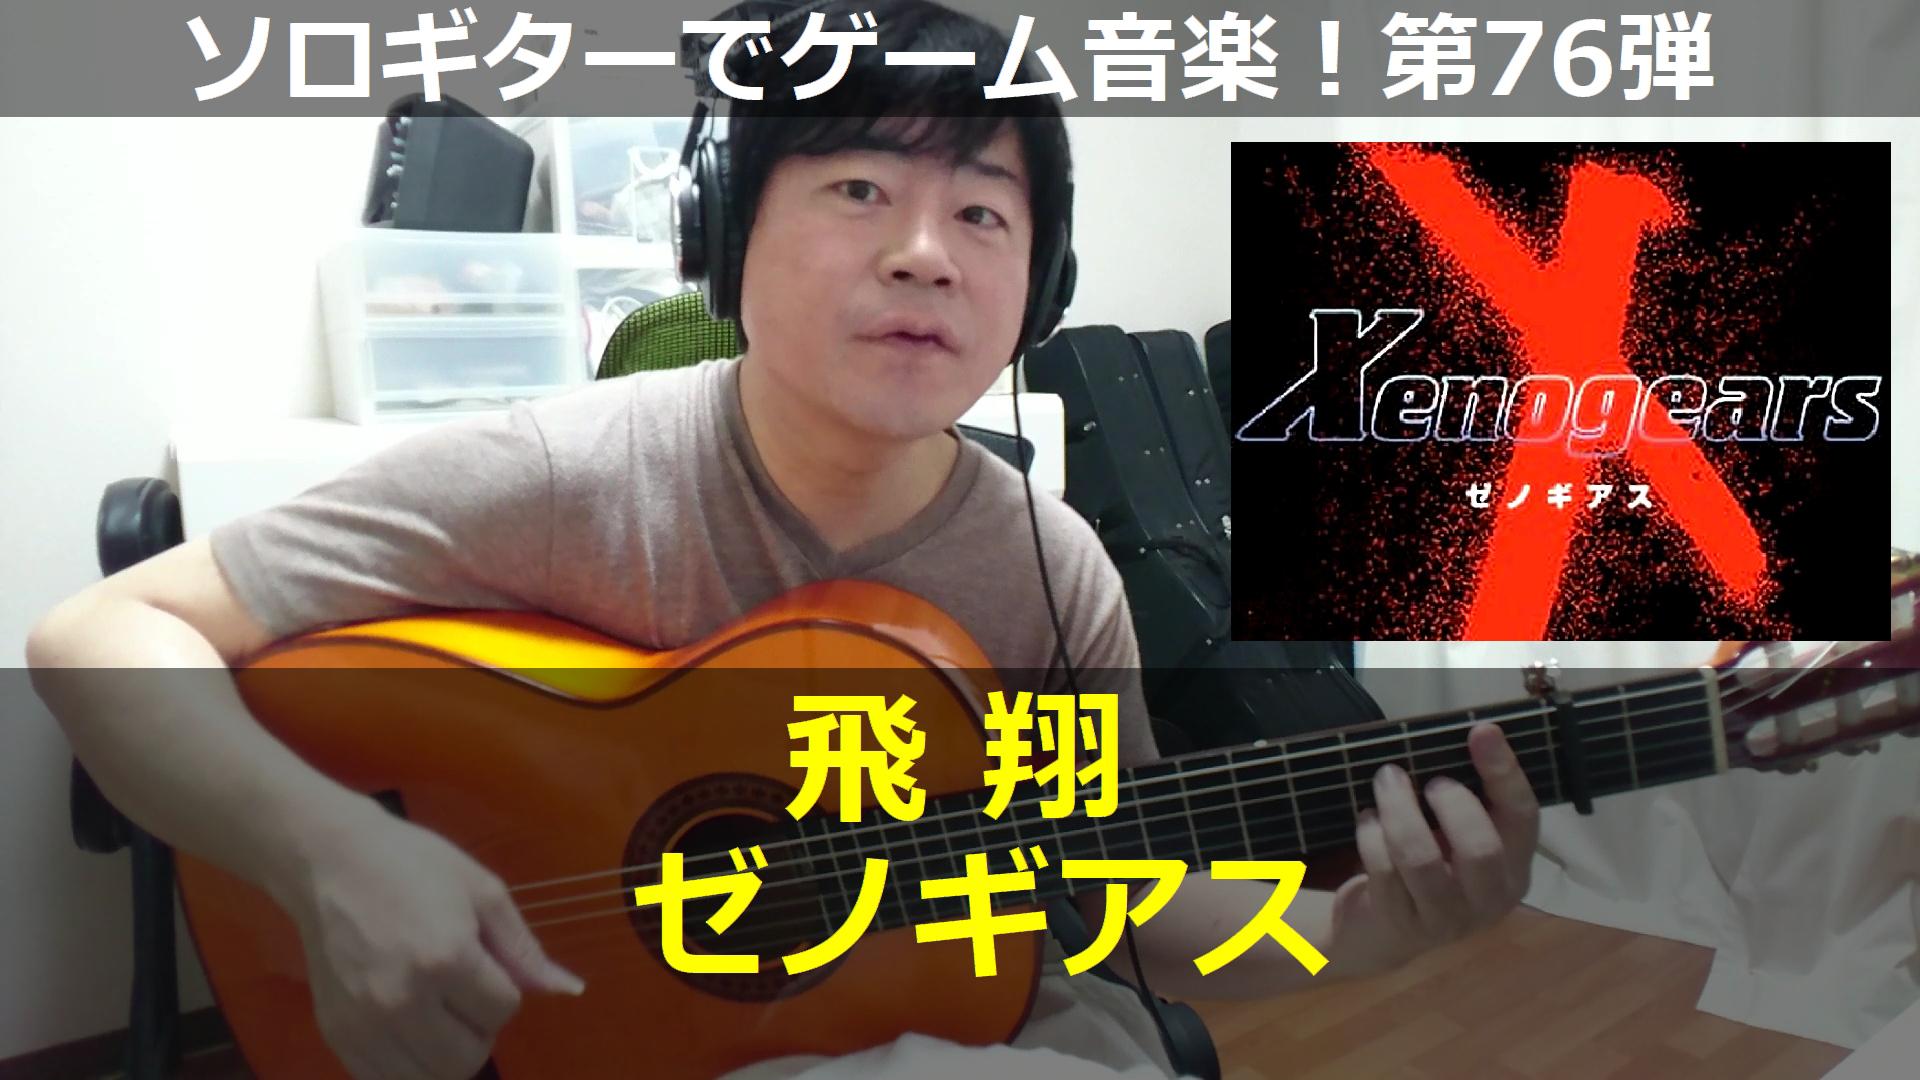 ゼノギアス 飛翔 ギター演奏